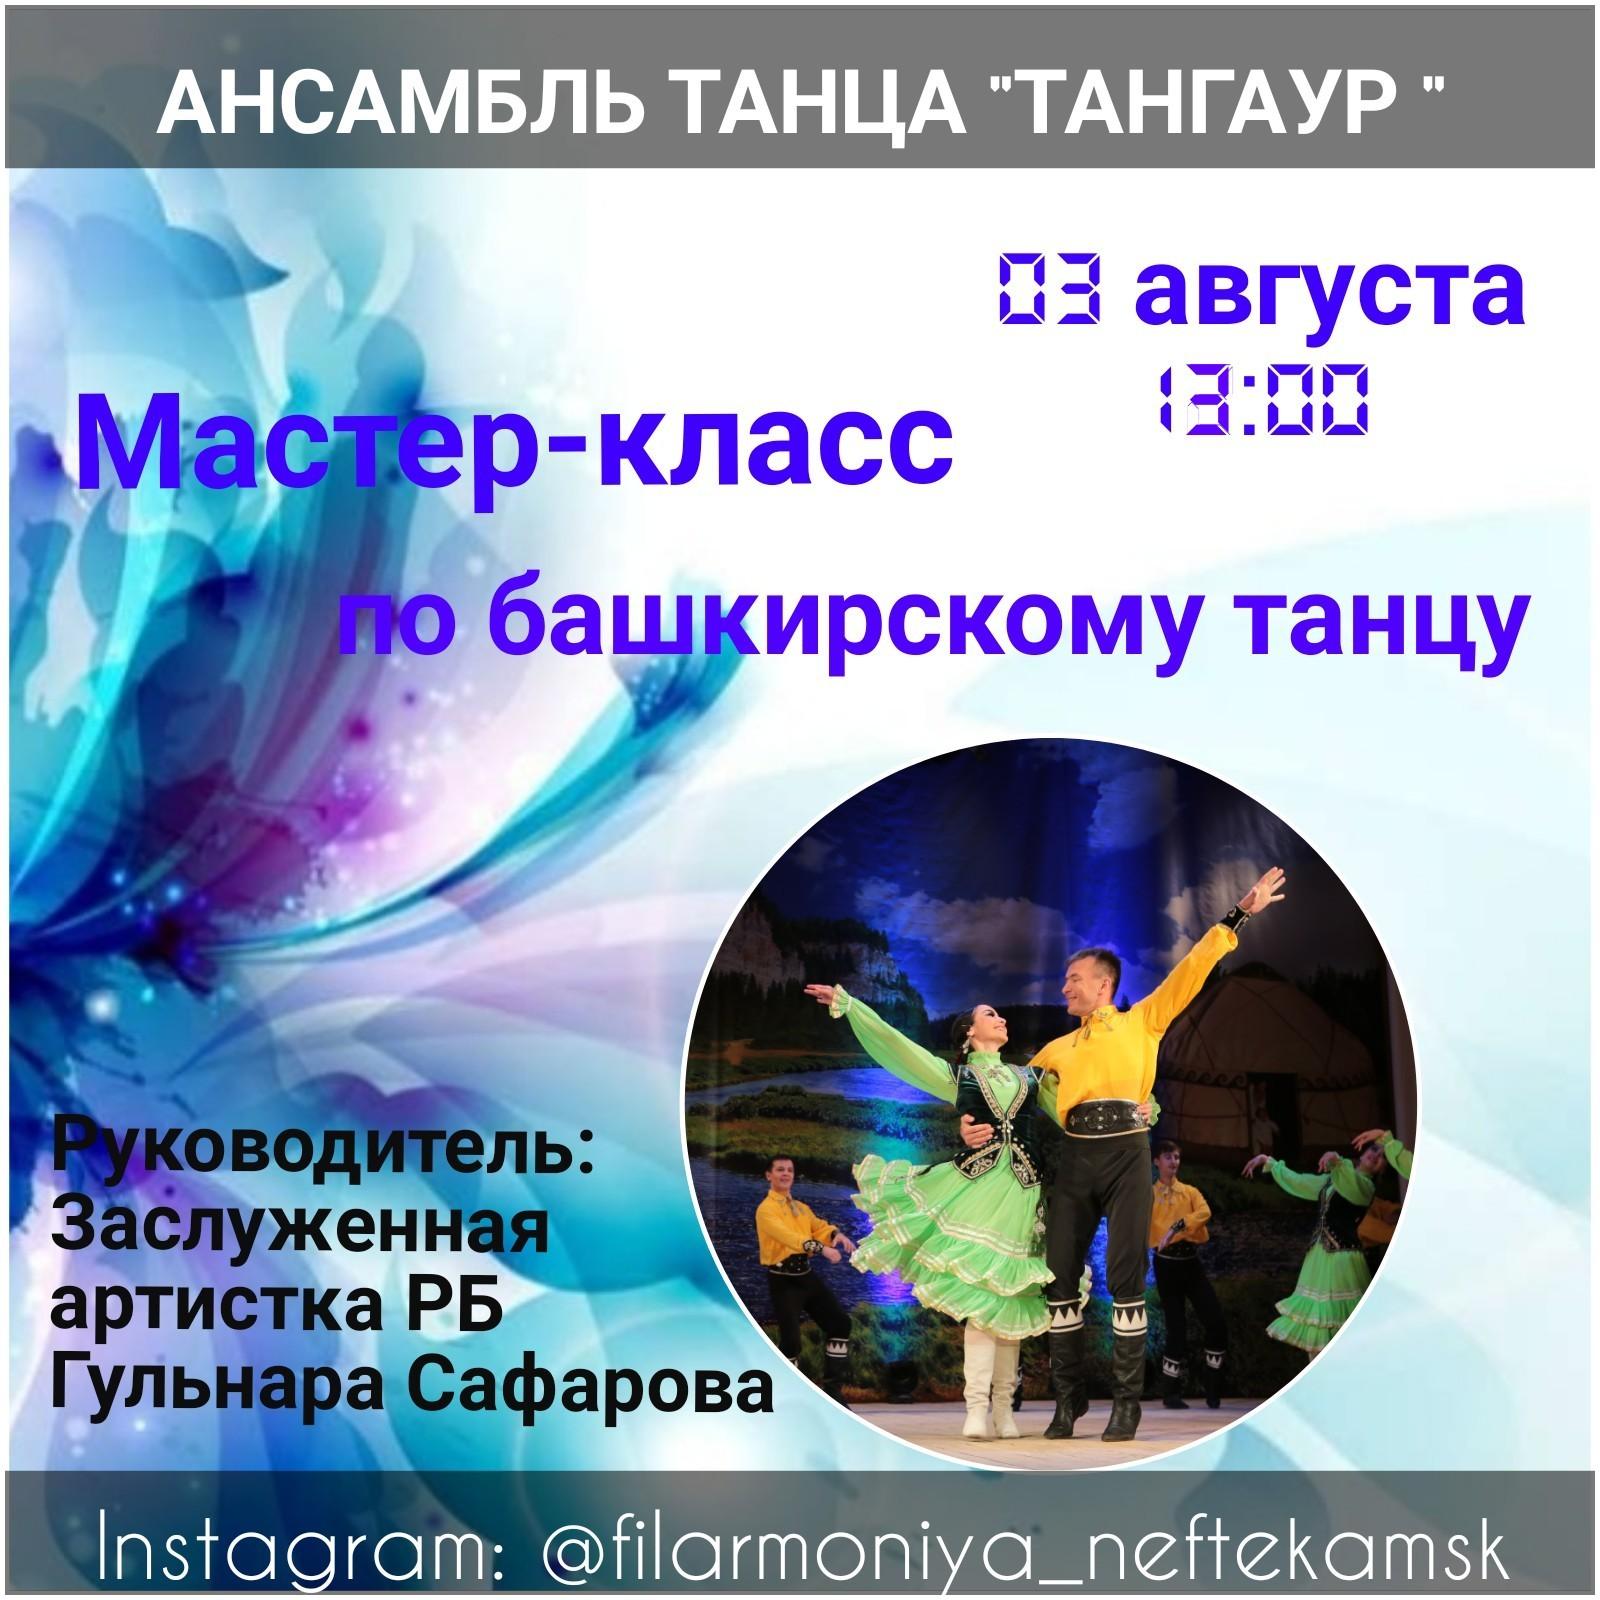 Мастер-класс по башкирскому танцу